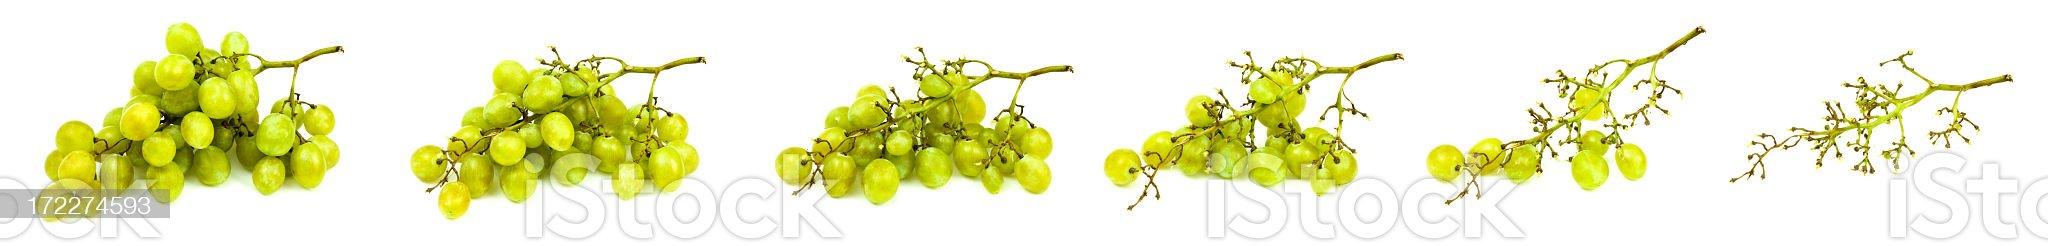 eating a tasty ripe white grape royalty-free stock photo